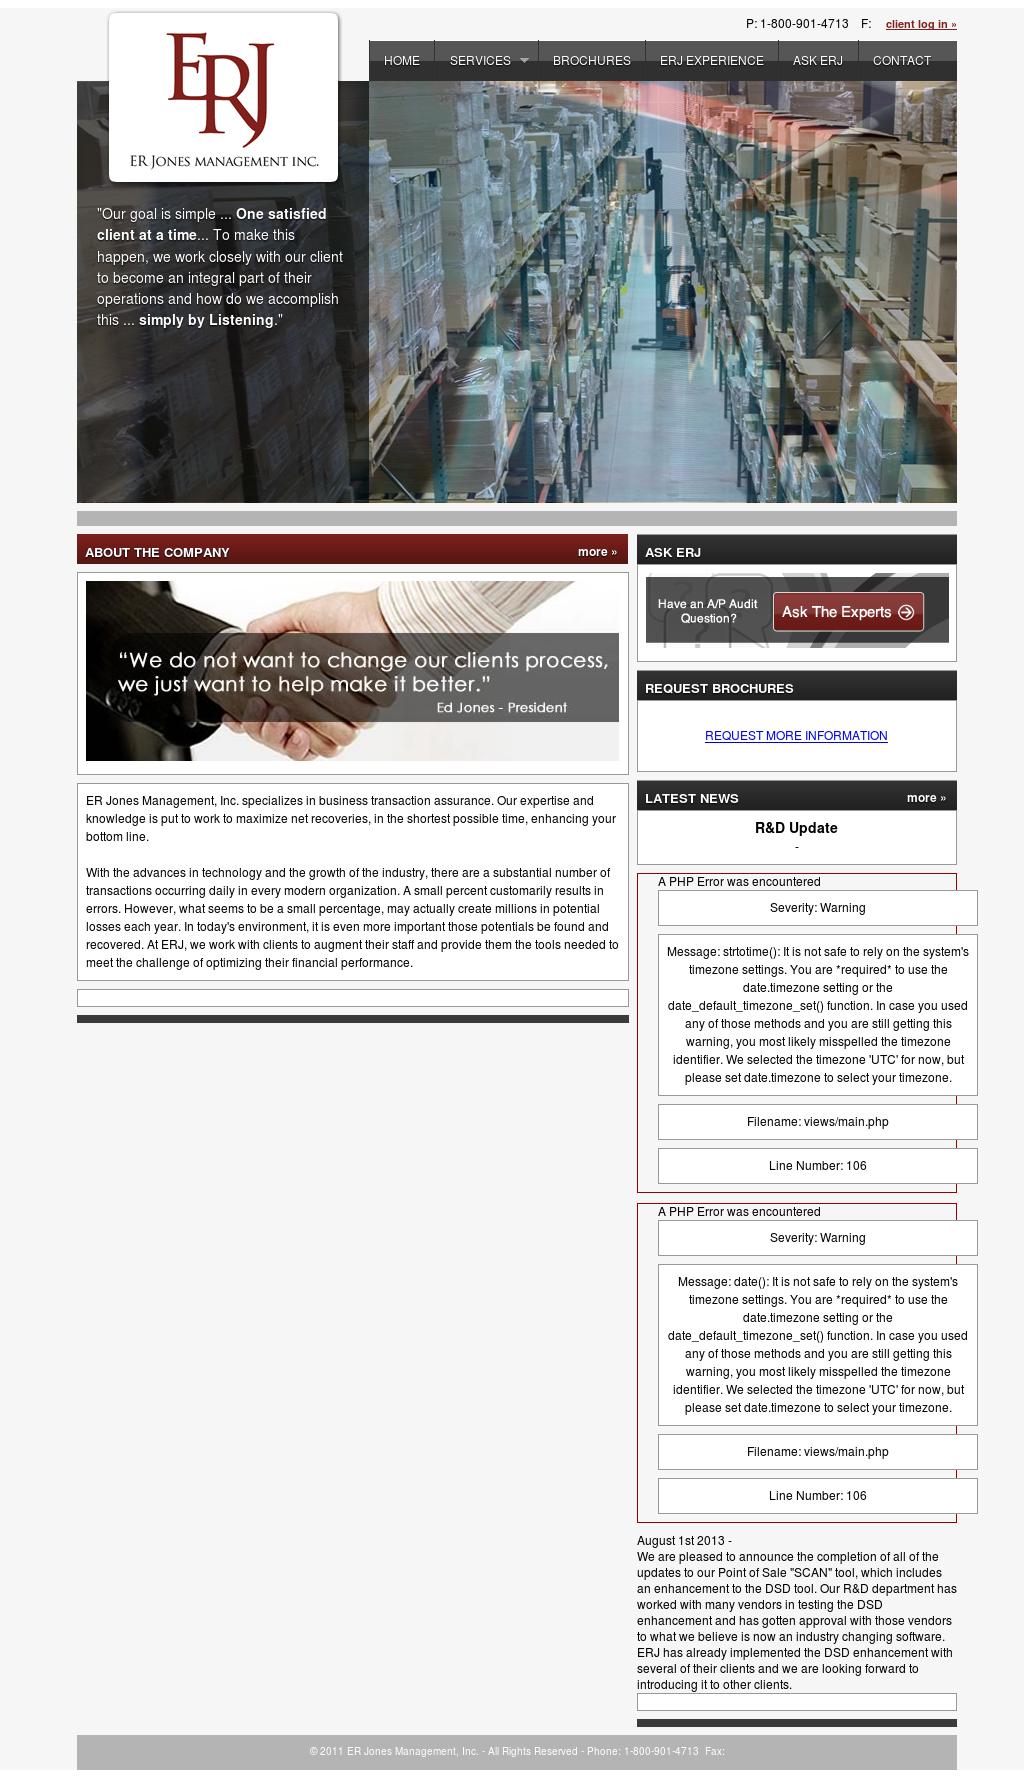 Ed Jones Login >> Er Jones Management Competitors Revenue And Employees Owler